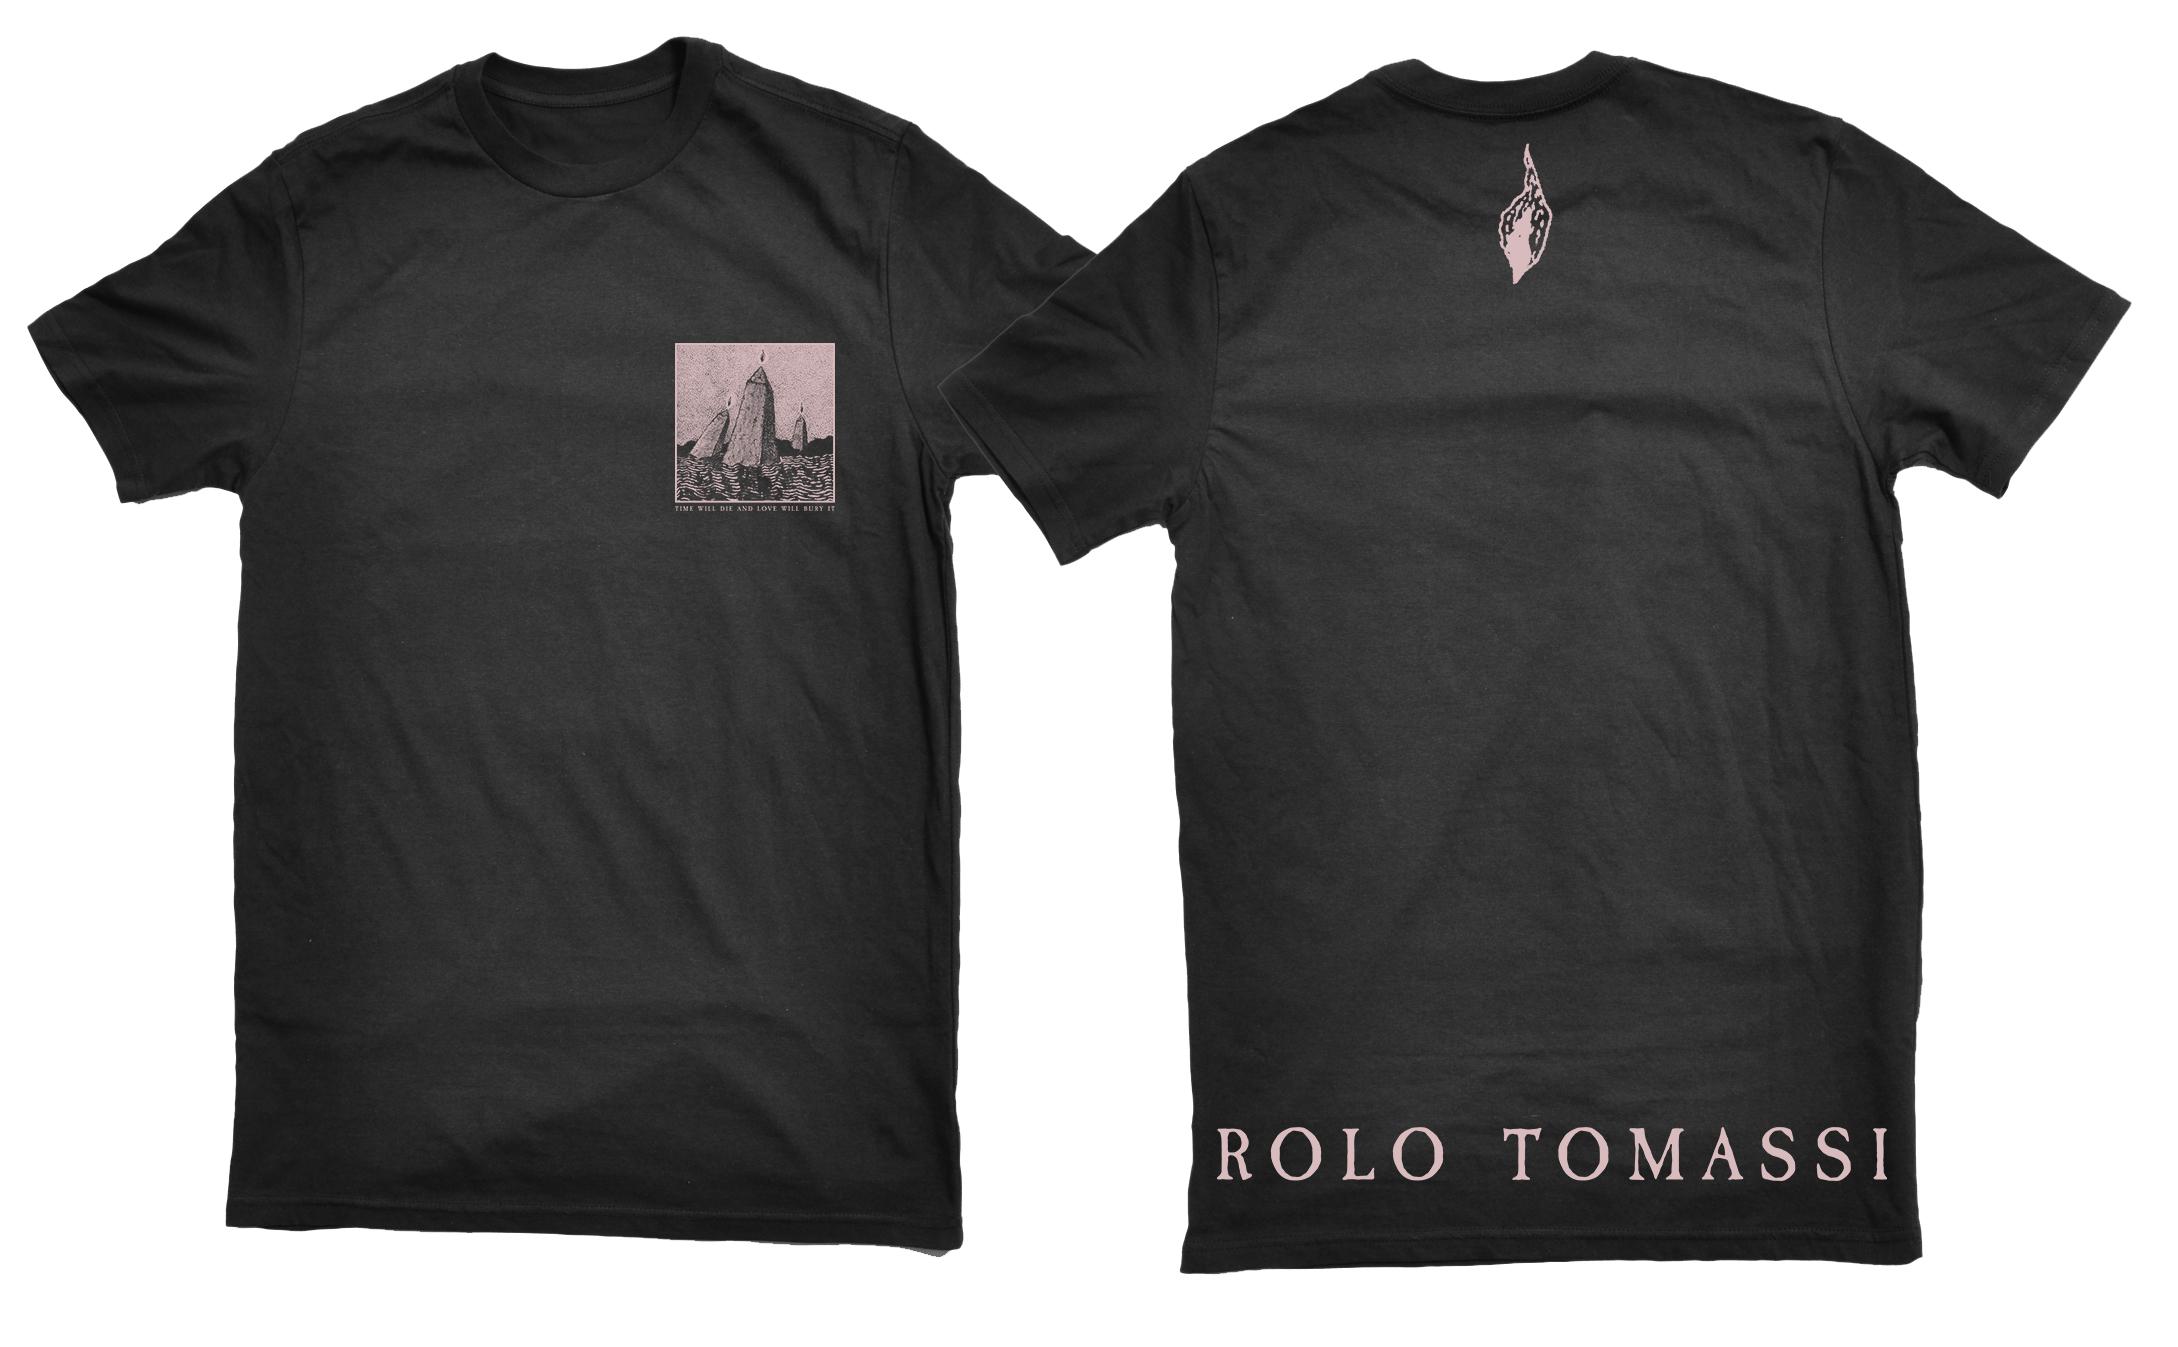 Rolo Tomassi - '...Love Will Bury It' shirt